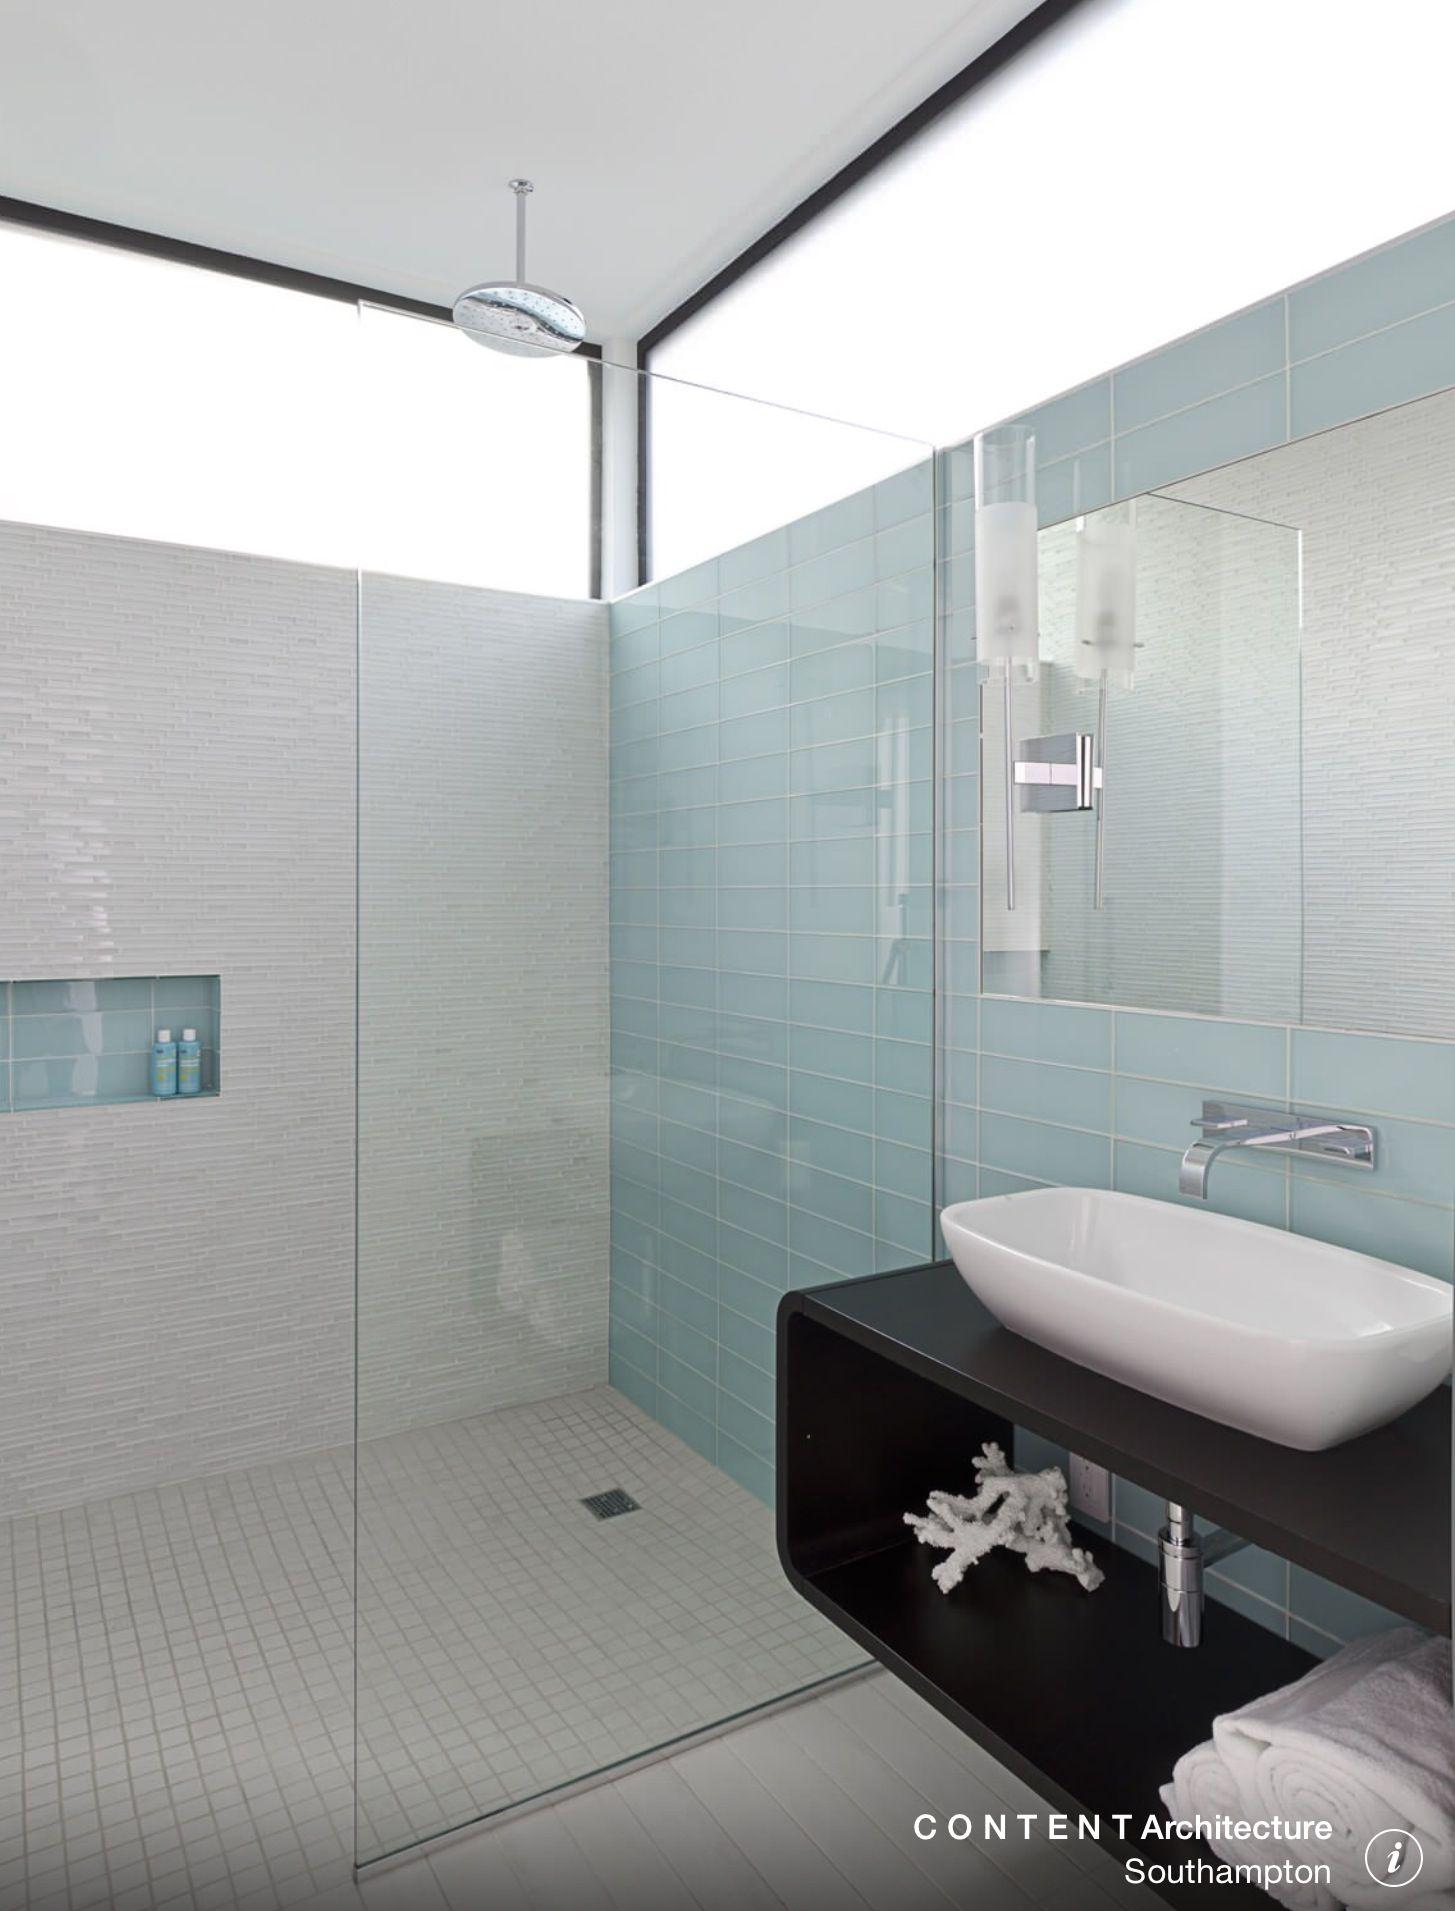 Pin by Kamer Kosereisoglu on Bathrooms | Pinterest | Houzz, Loft ...